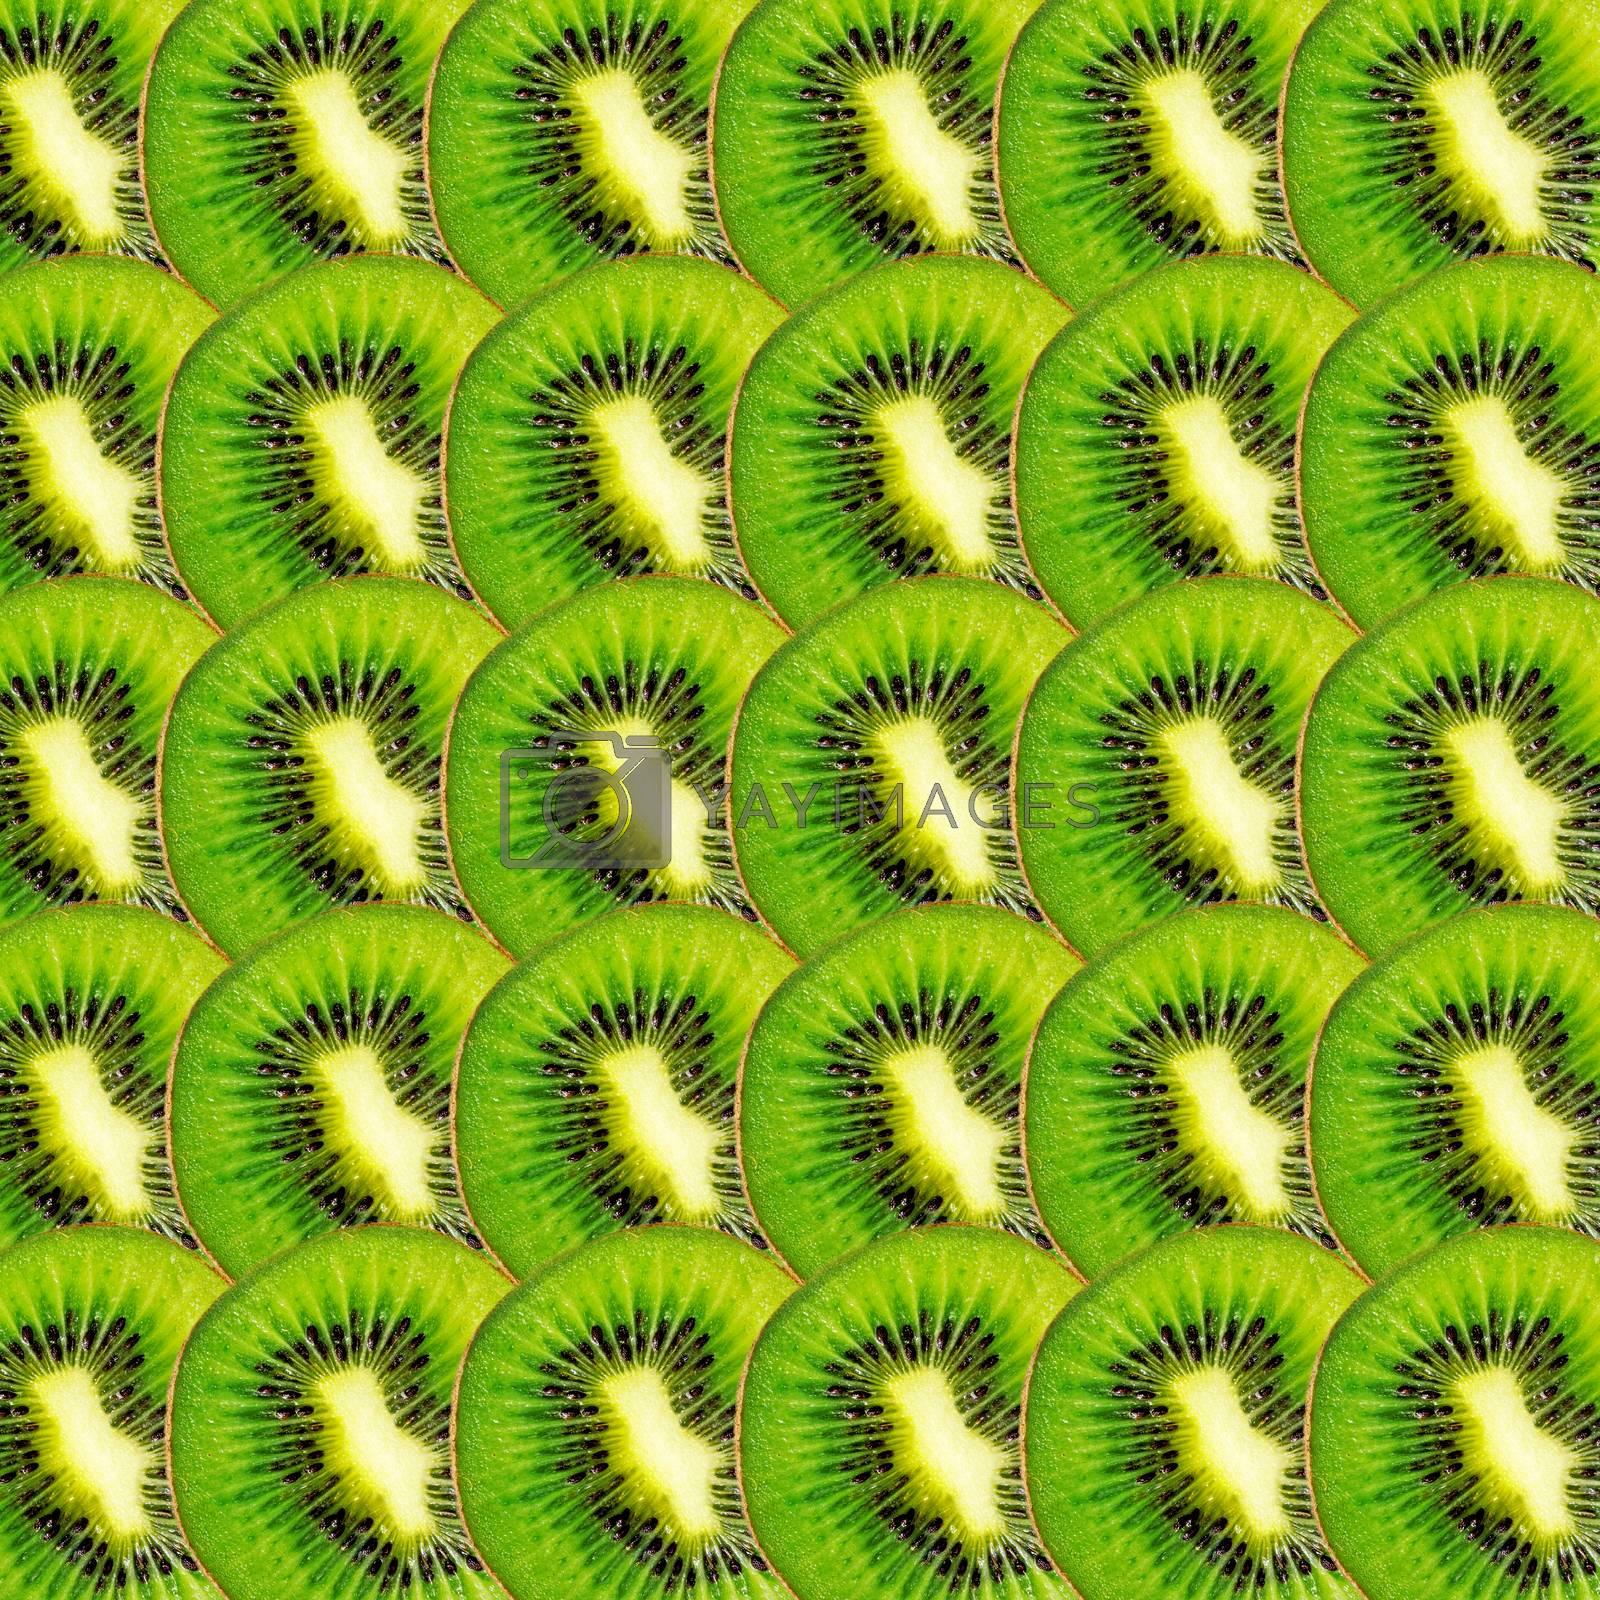 Green kiwi fruit slices texture, real photo food background